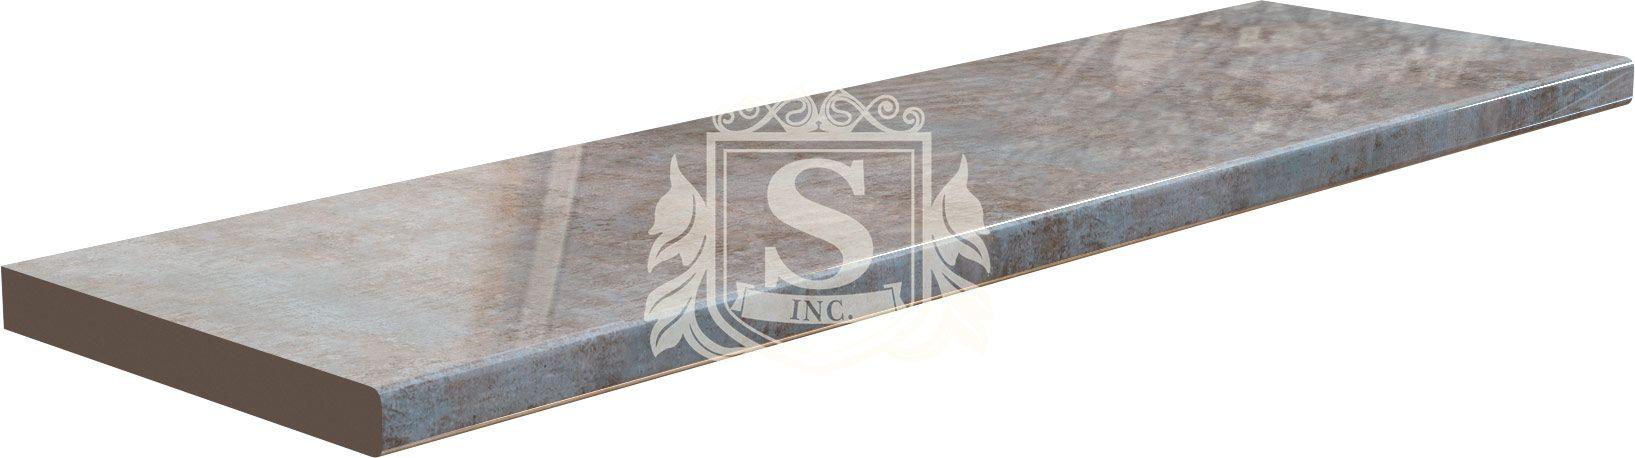 Столешница «Травентино» 1 м.п (38 мм)